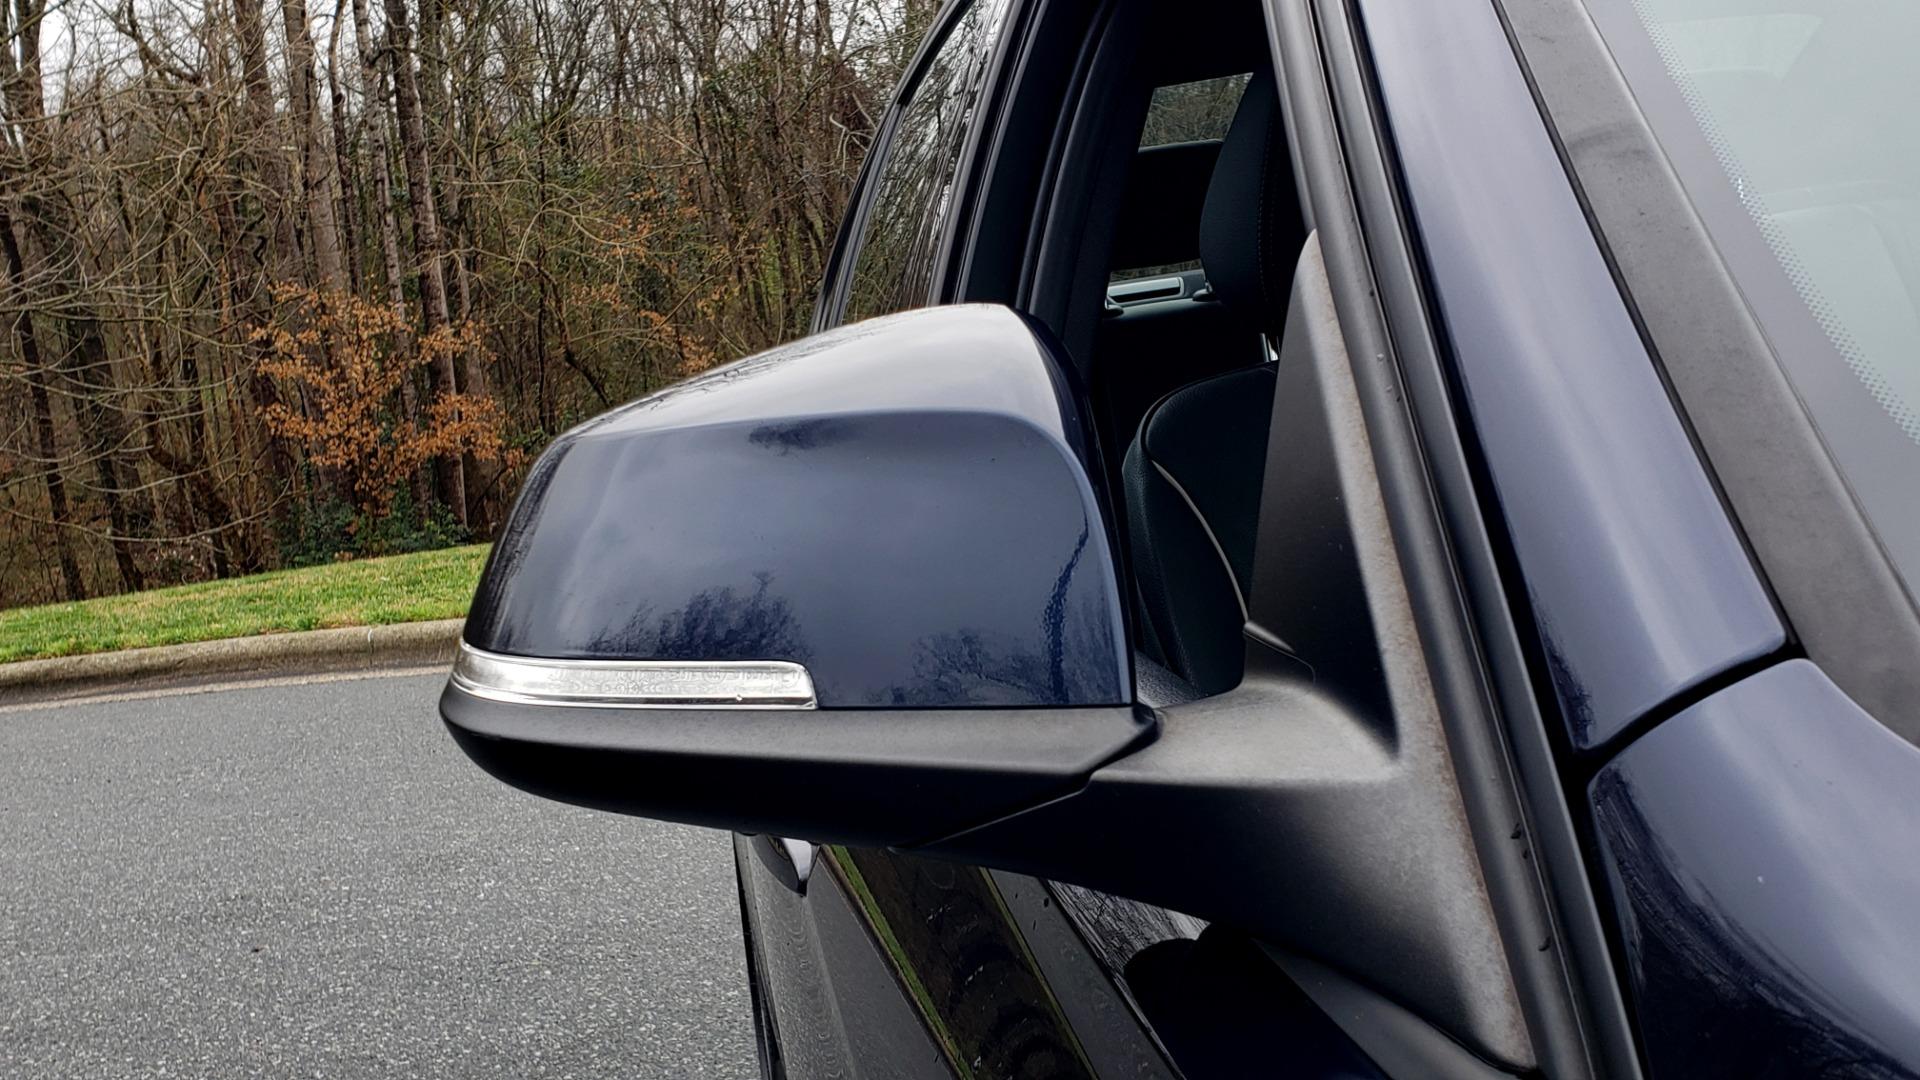 Used 2016 BMW 3 SERIES 328I PREMIUM PKG / DRVR ASST / SUNROOF / PARK ASST for sale Sold at Formula Imports in Charlotte NC 28227 23